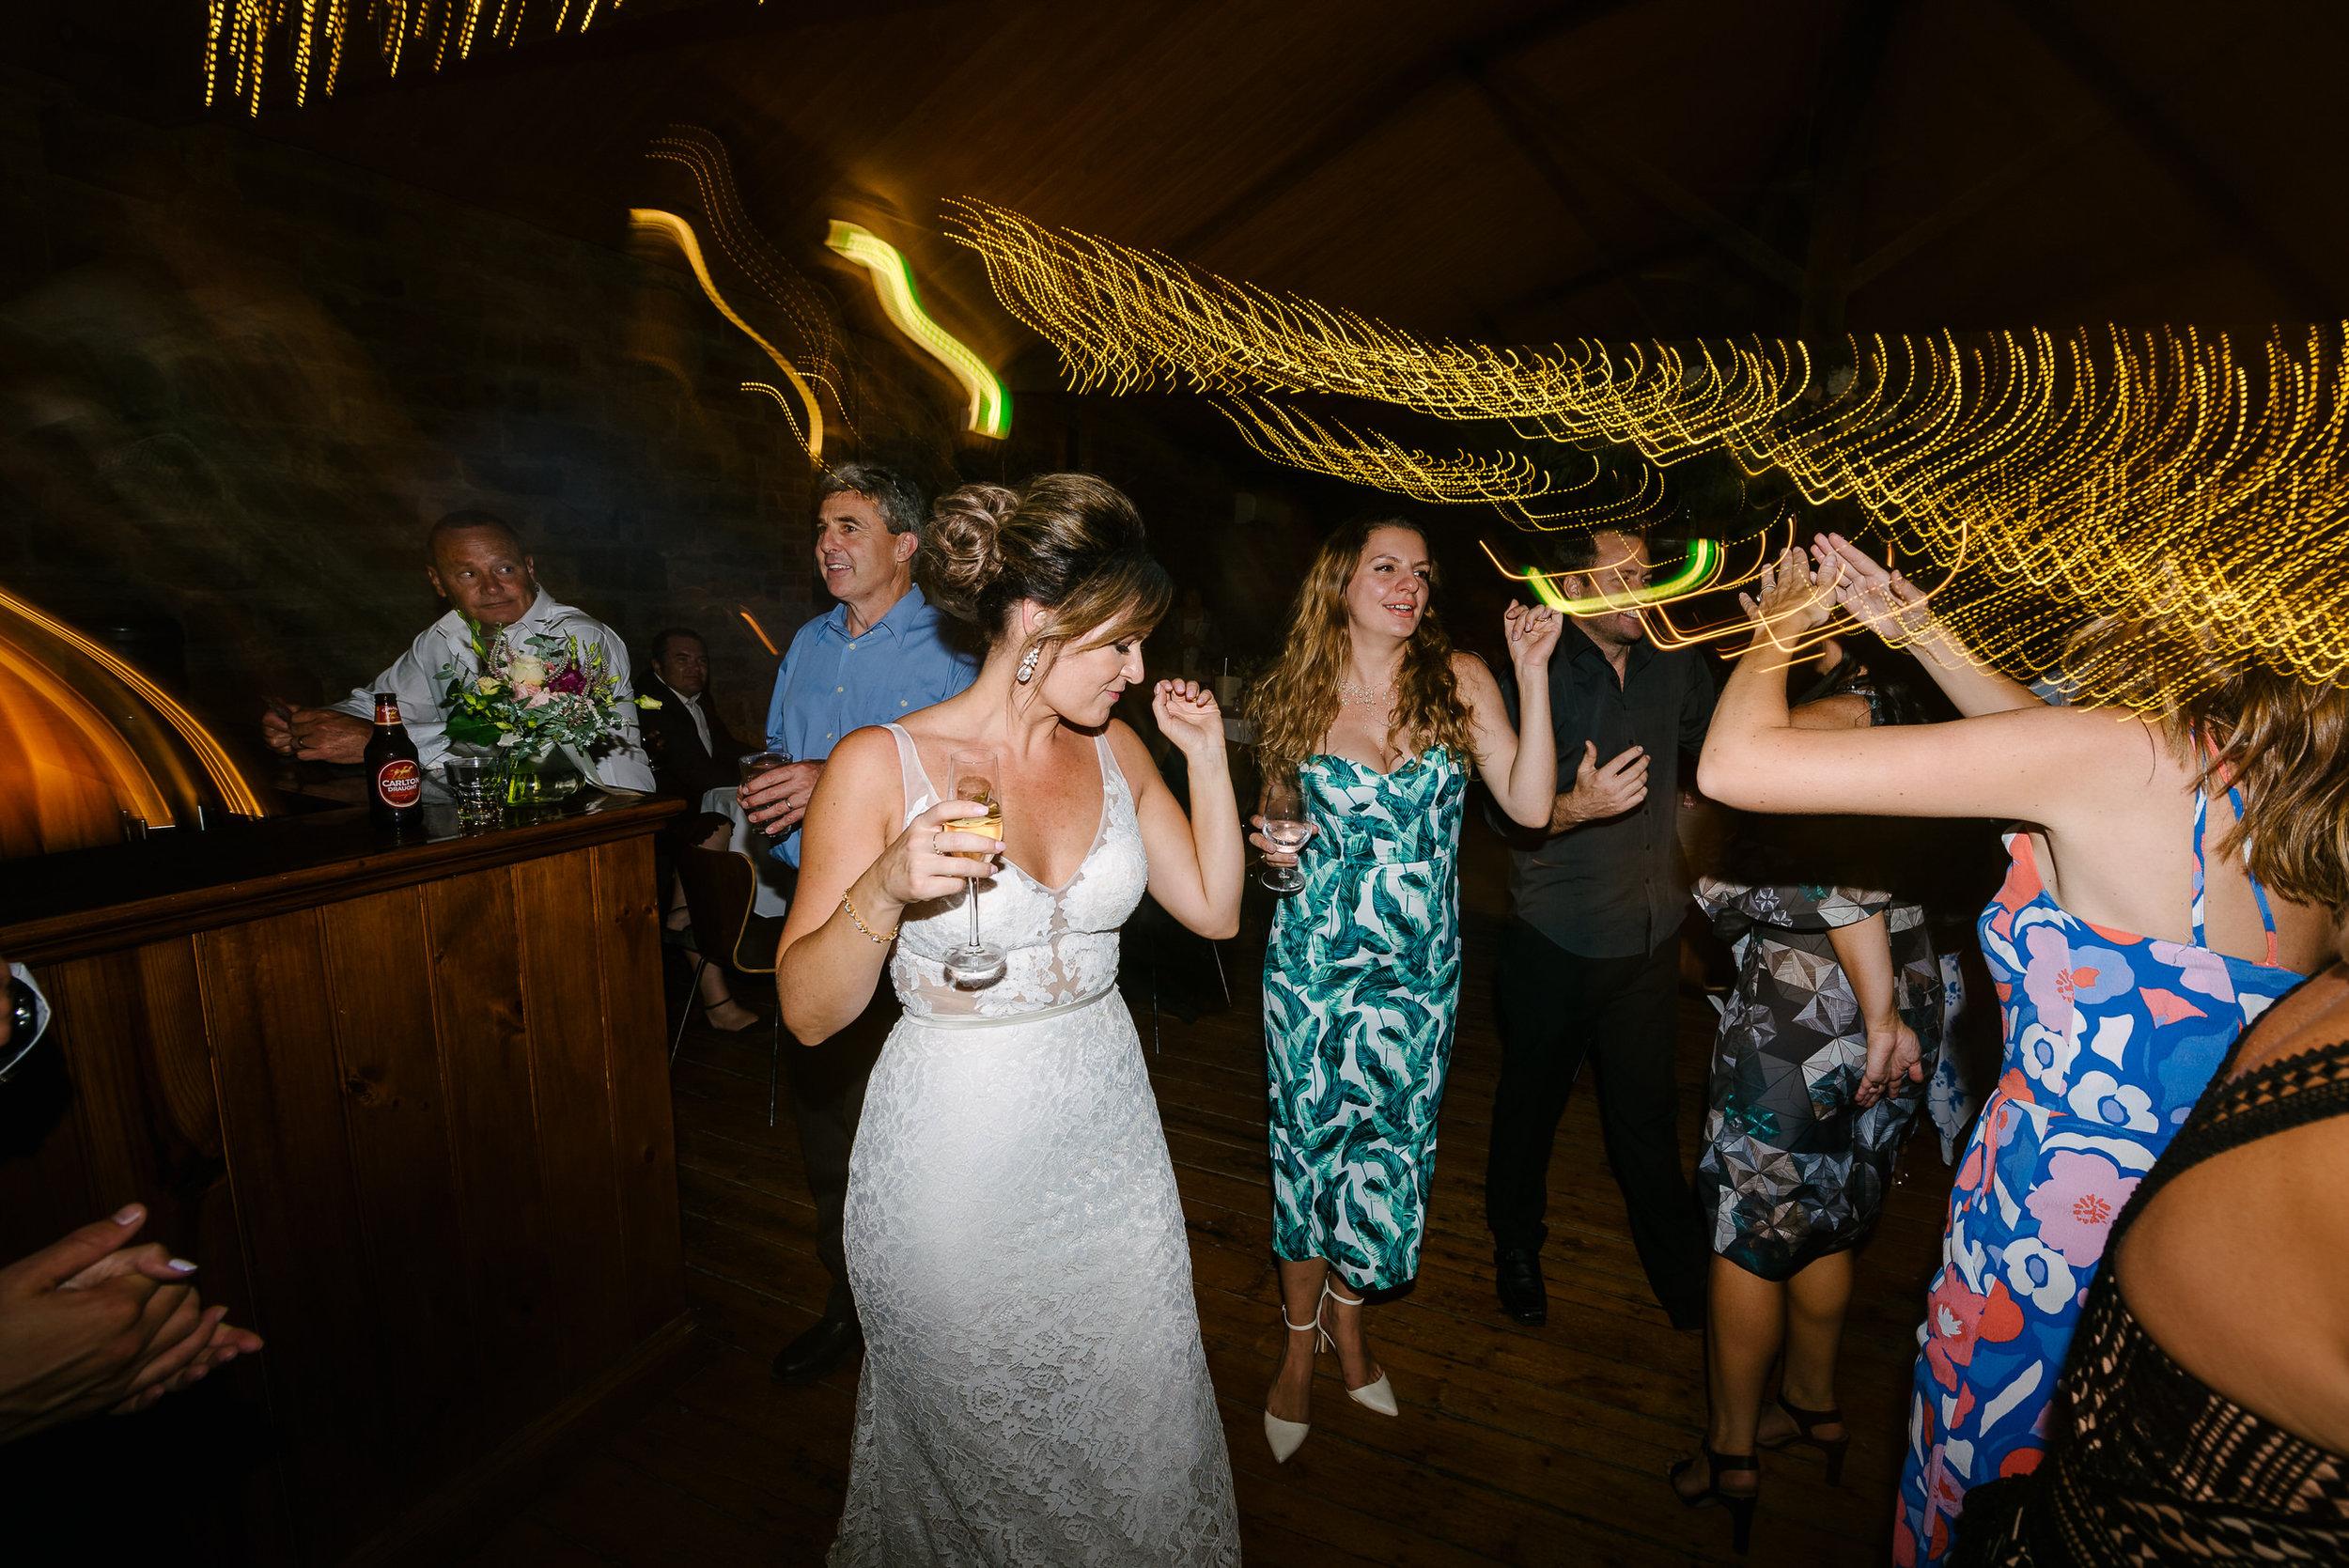 Justin_And_Jim_Photography_Chateau_Dore_Bendigo_Wedding115.JPG